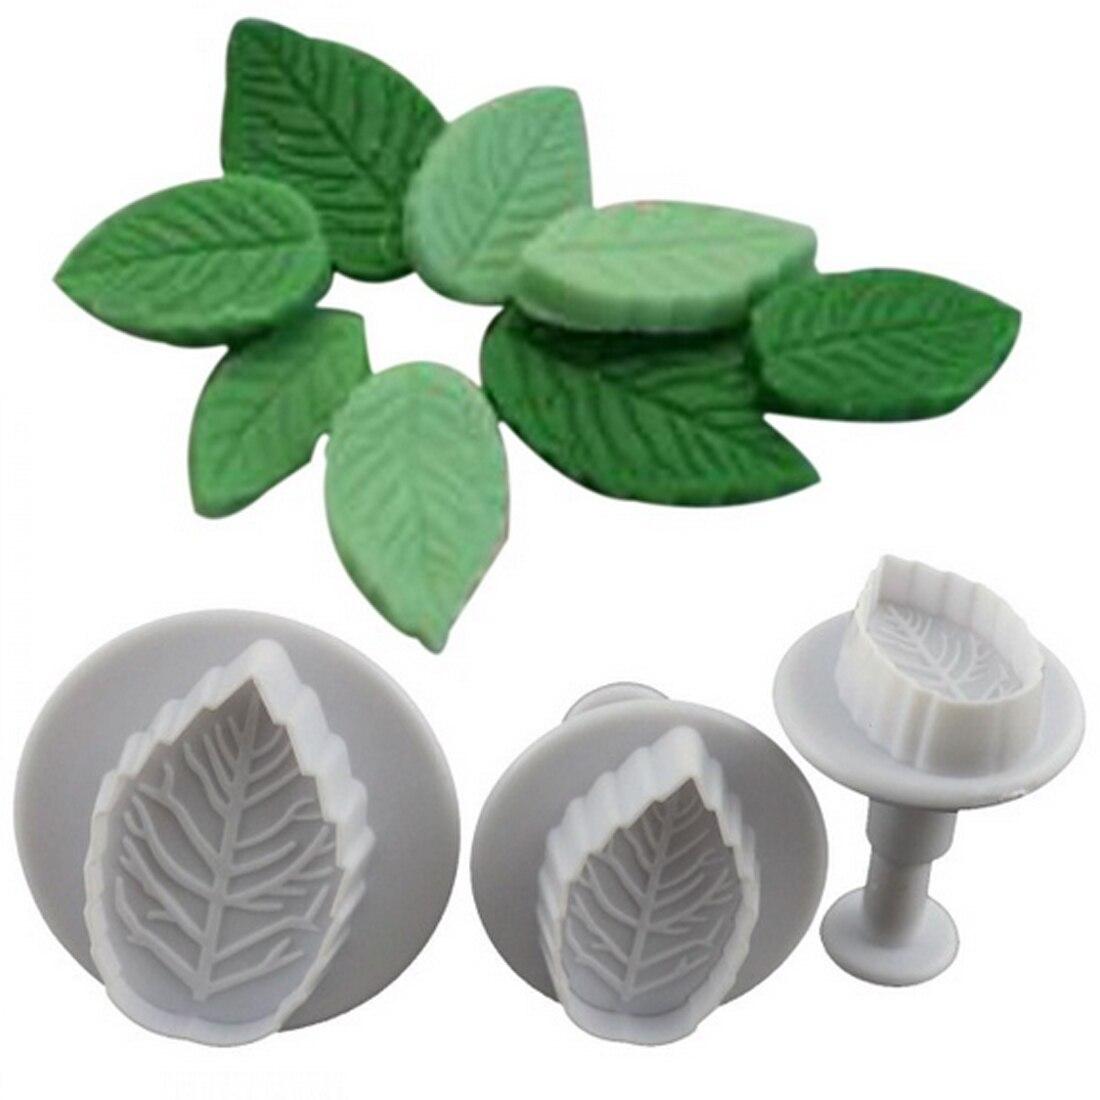 New Fashion 3Pcs/Set Rose Leaf Shape Mold Fondant Cake Sugar Craft Plunger Cutters